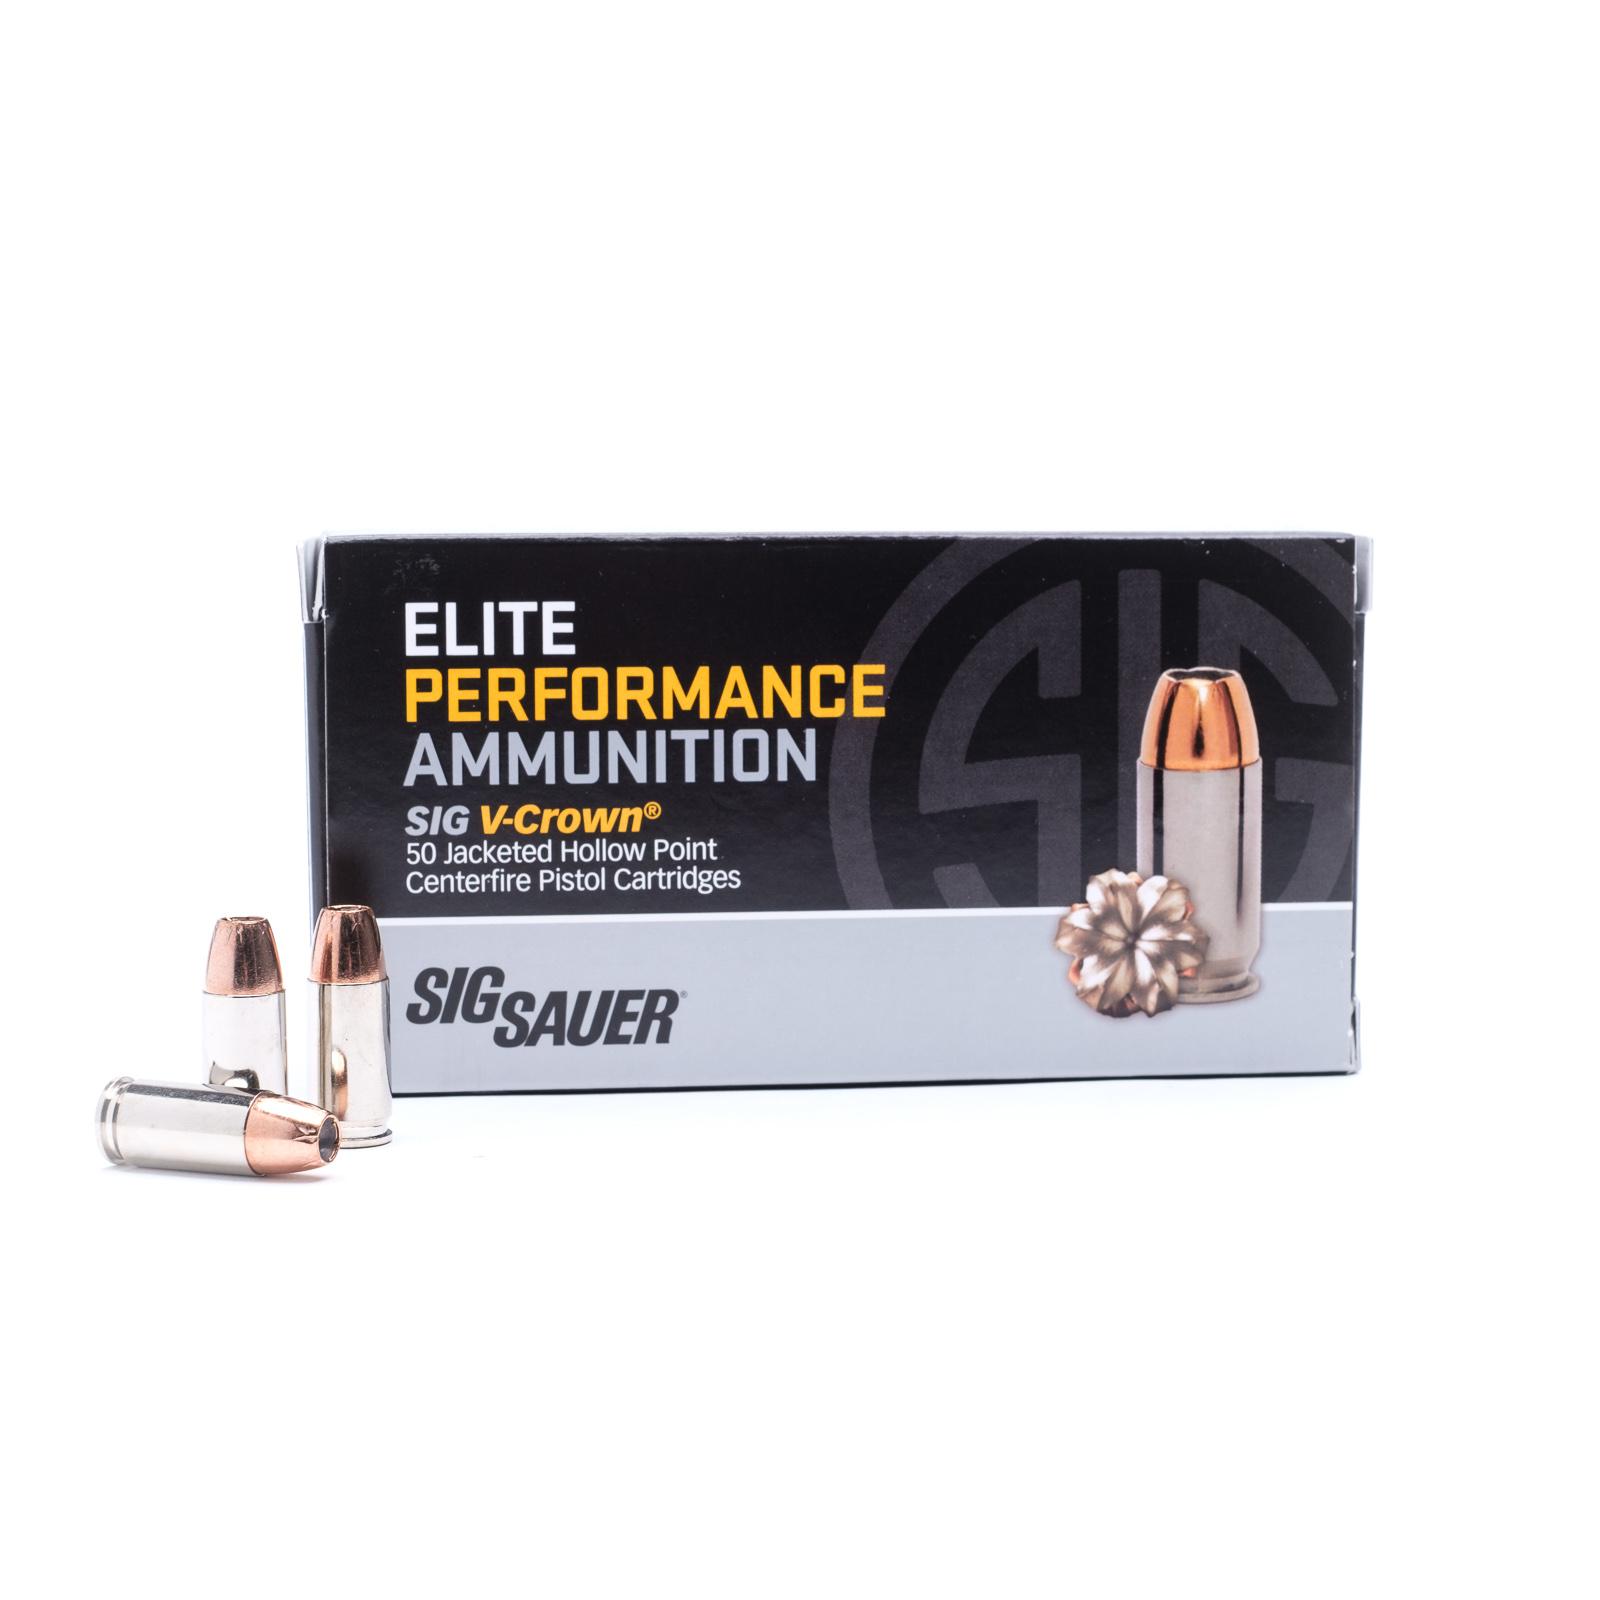 Sig Sauer, Elite Performance V-Crown, 9MM Ammunition, 147 Grain, Jacketed Hollow Point, 50 Round Box